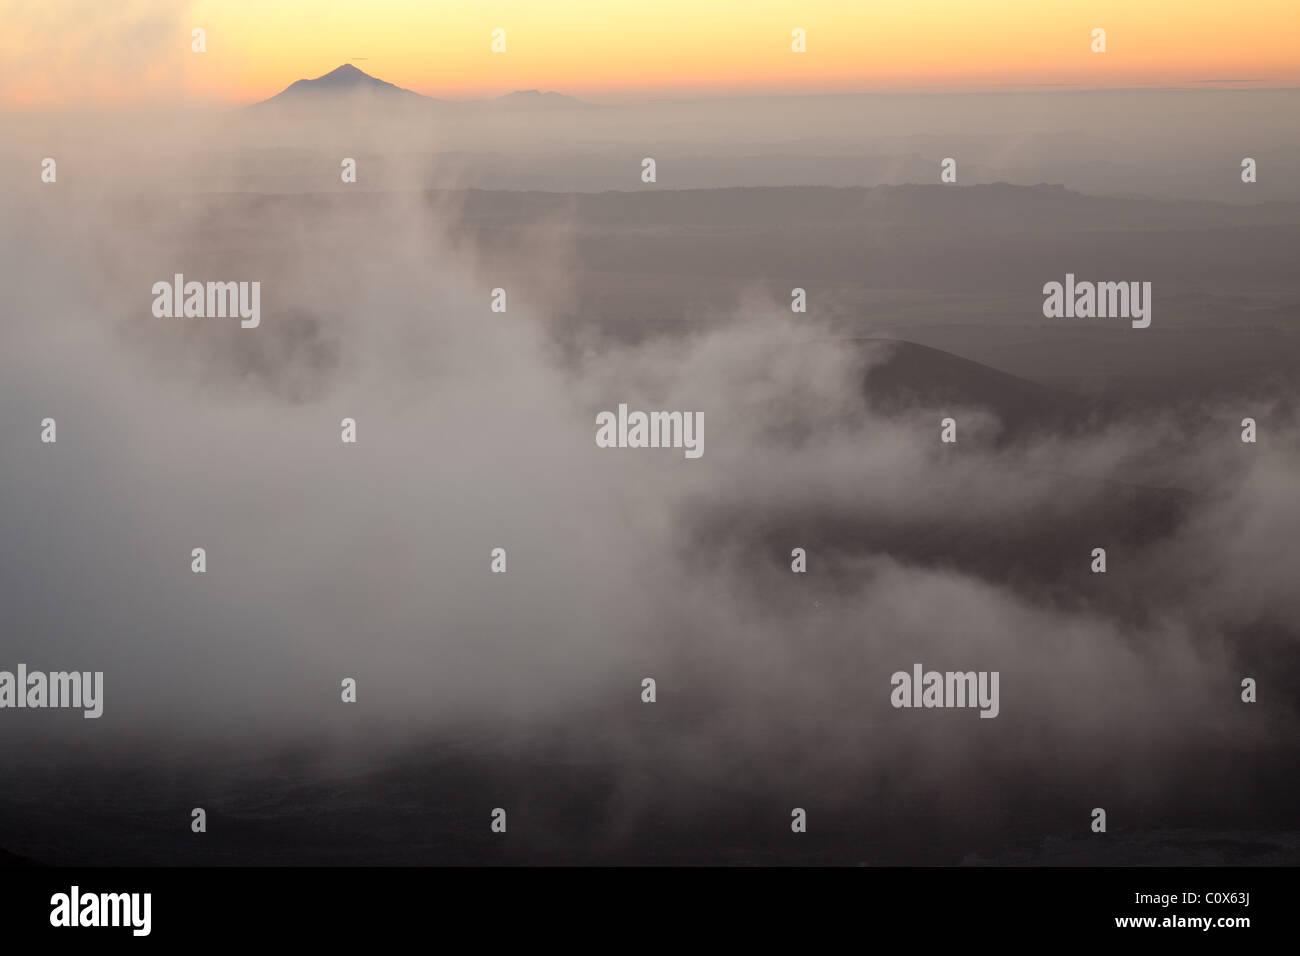 looking across Mangatepopo Valley, Tongariro Alpine Crossing, Tongariro National Park, North Island, New Zealand - Stock Image